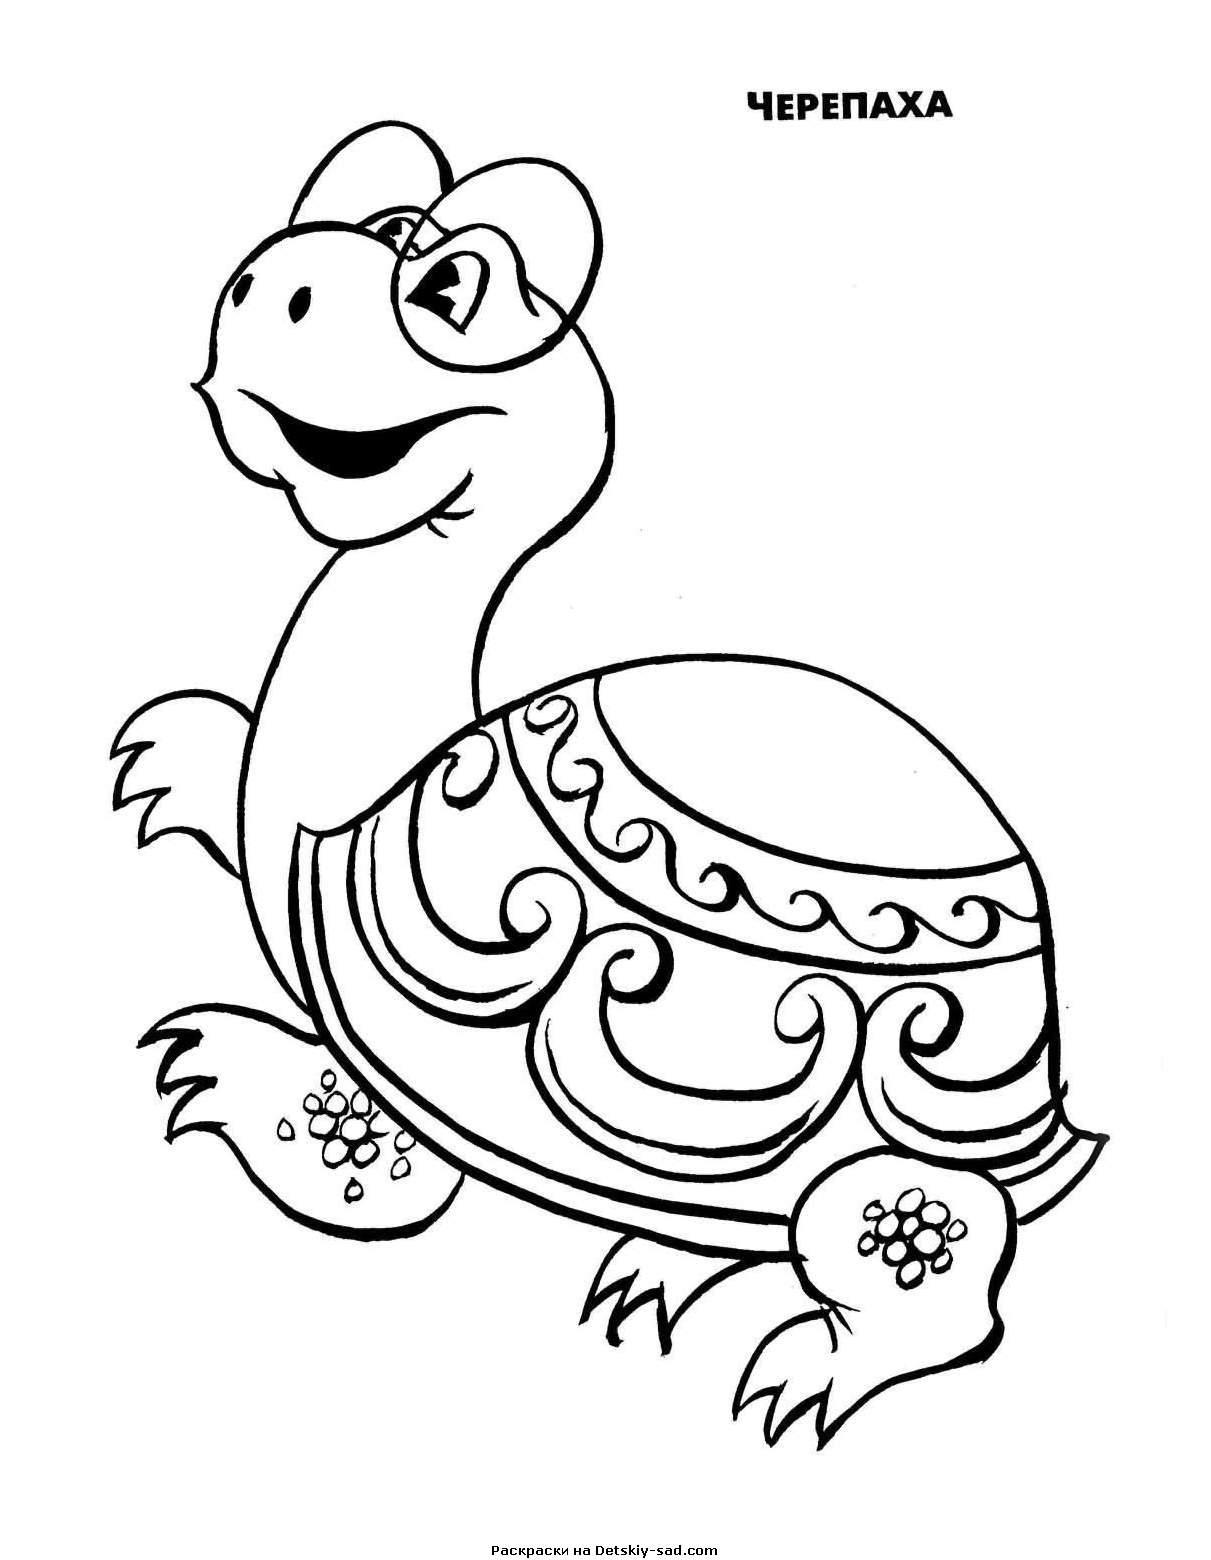 Львенок и черепаха раскраски